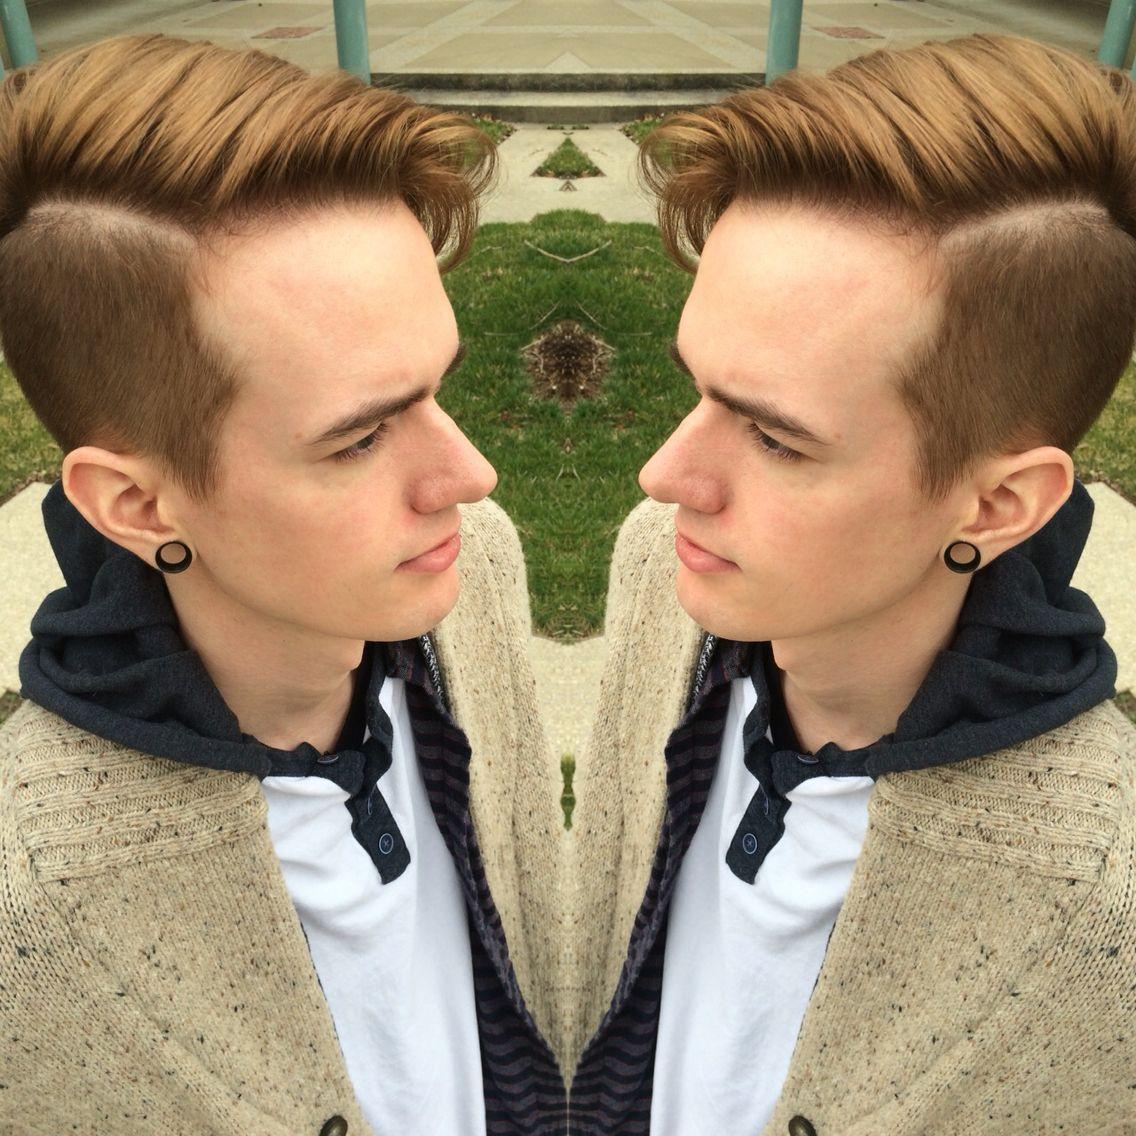 Semi long haircuts for men menscuts hardpart hairstyle man manhairstyle alternative